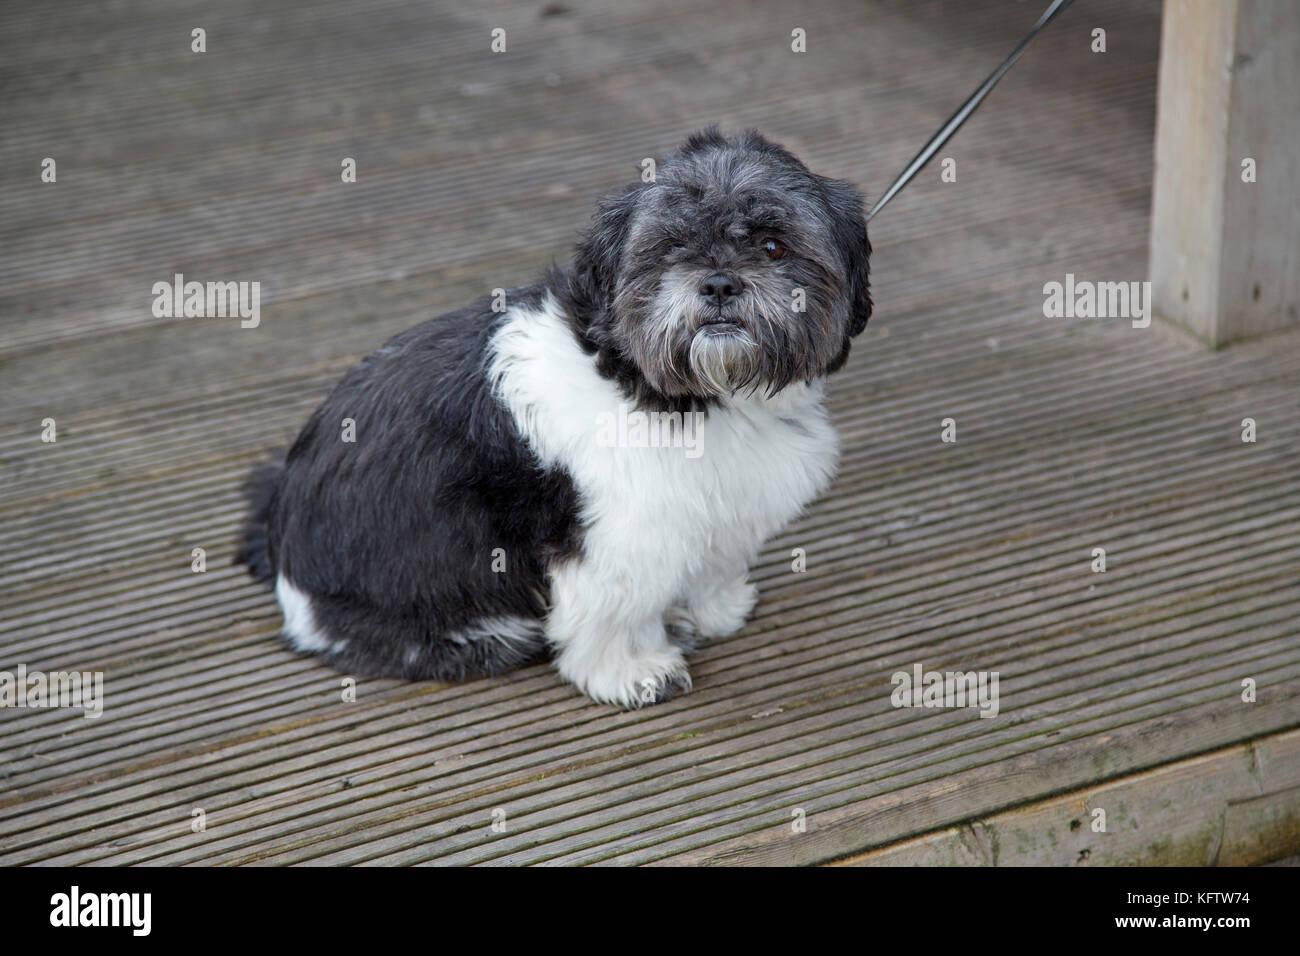 little dog, Portrush, Co. Antrim, Northern Ireland - Stock Image